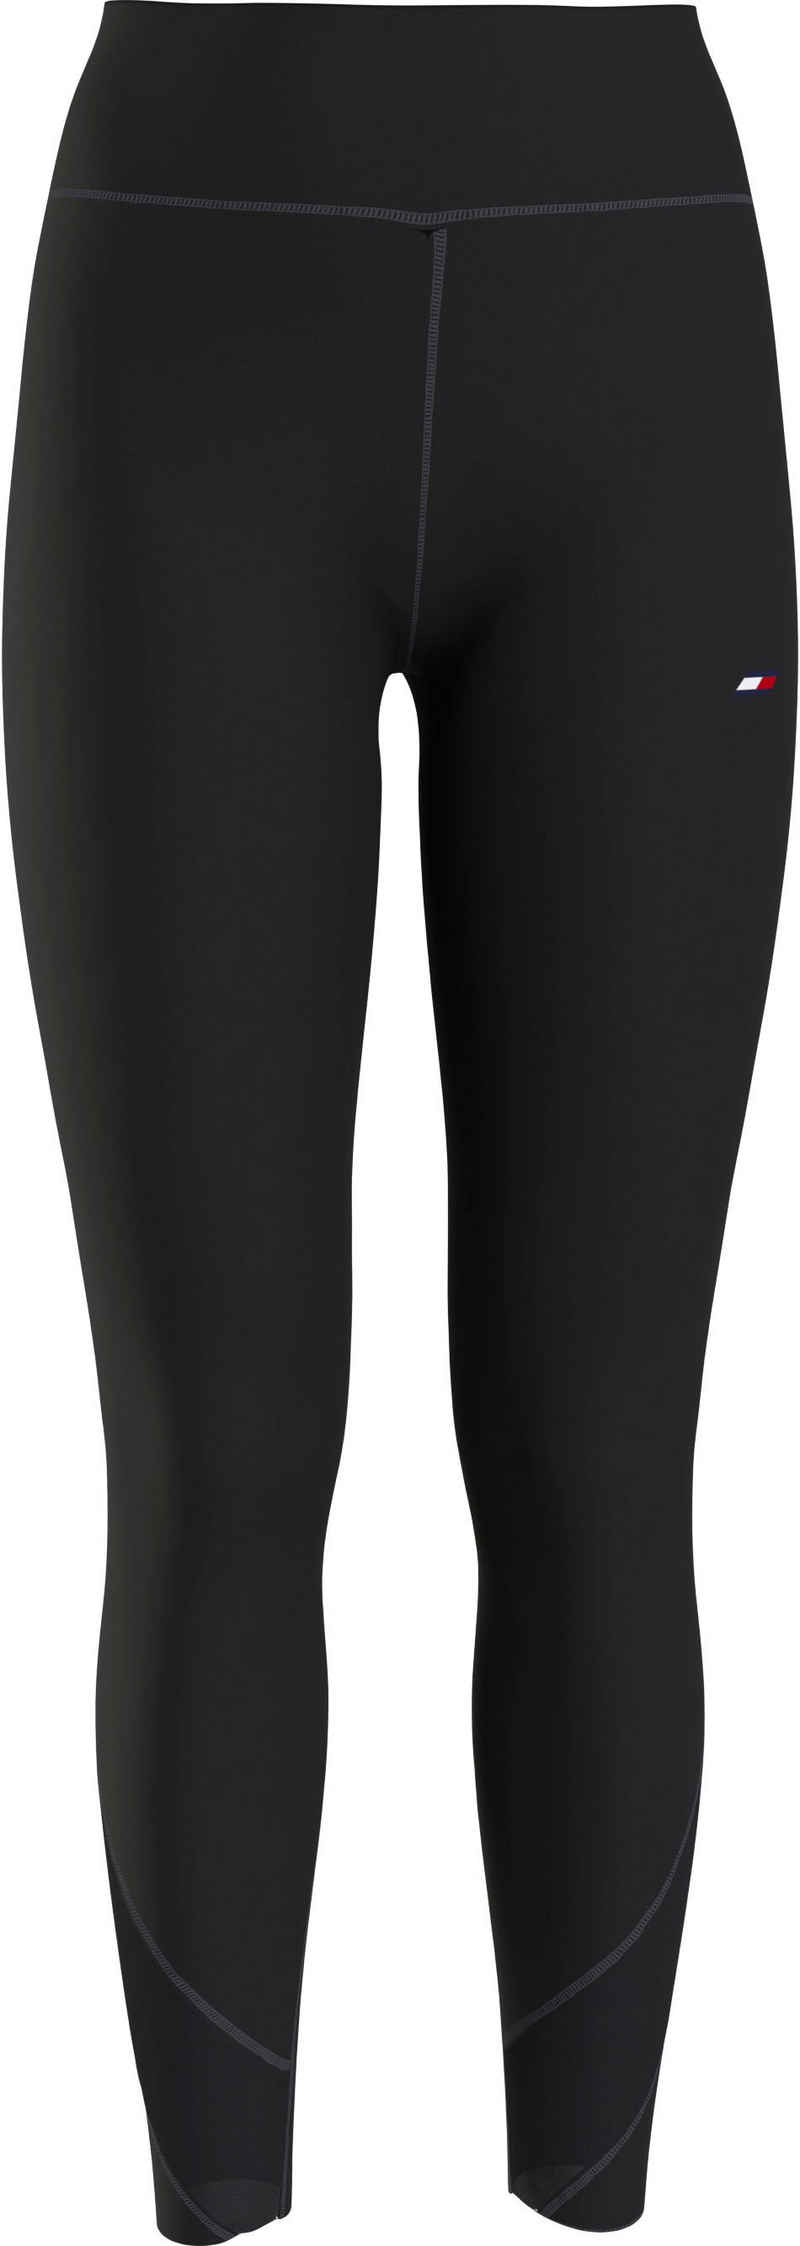 Tommy Hilfiger Sport 3/4-Leggings »HW MESH MIX LEGGING 7/8« mit Tommy Hilfiger Sport Logo-Flag auf dem Bein